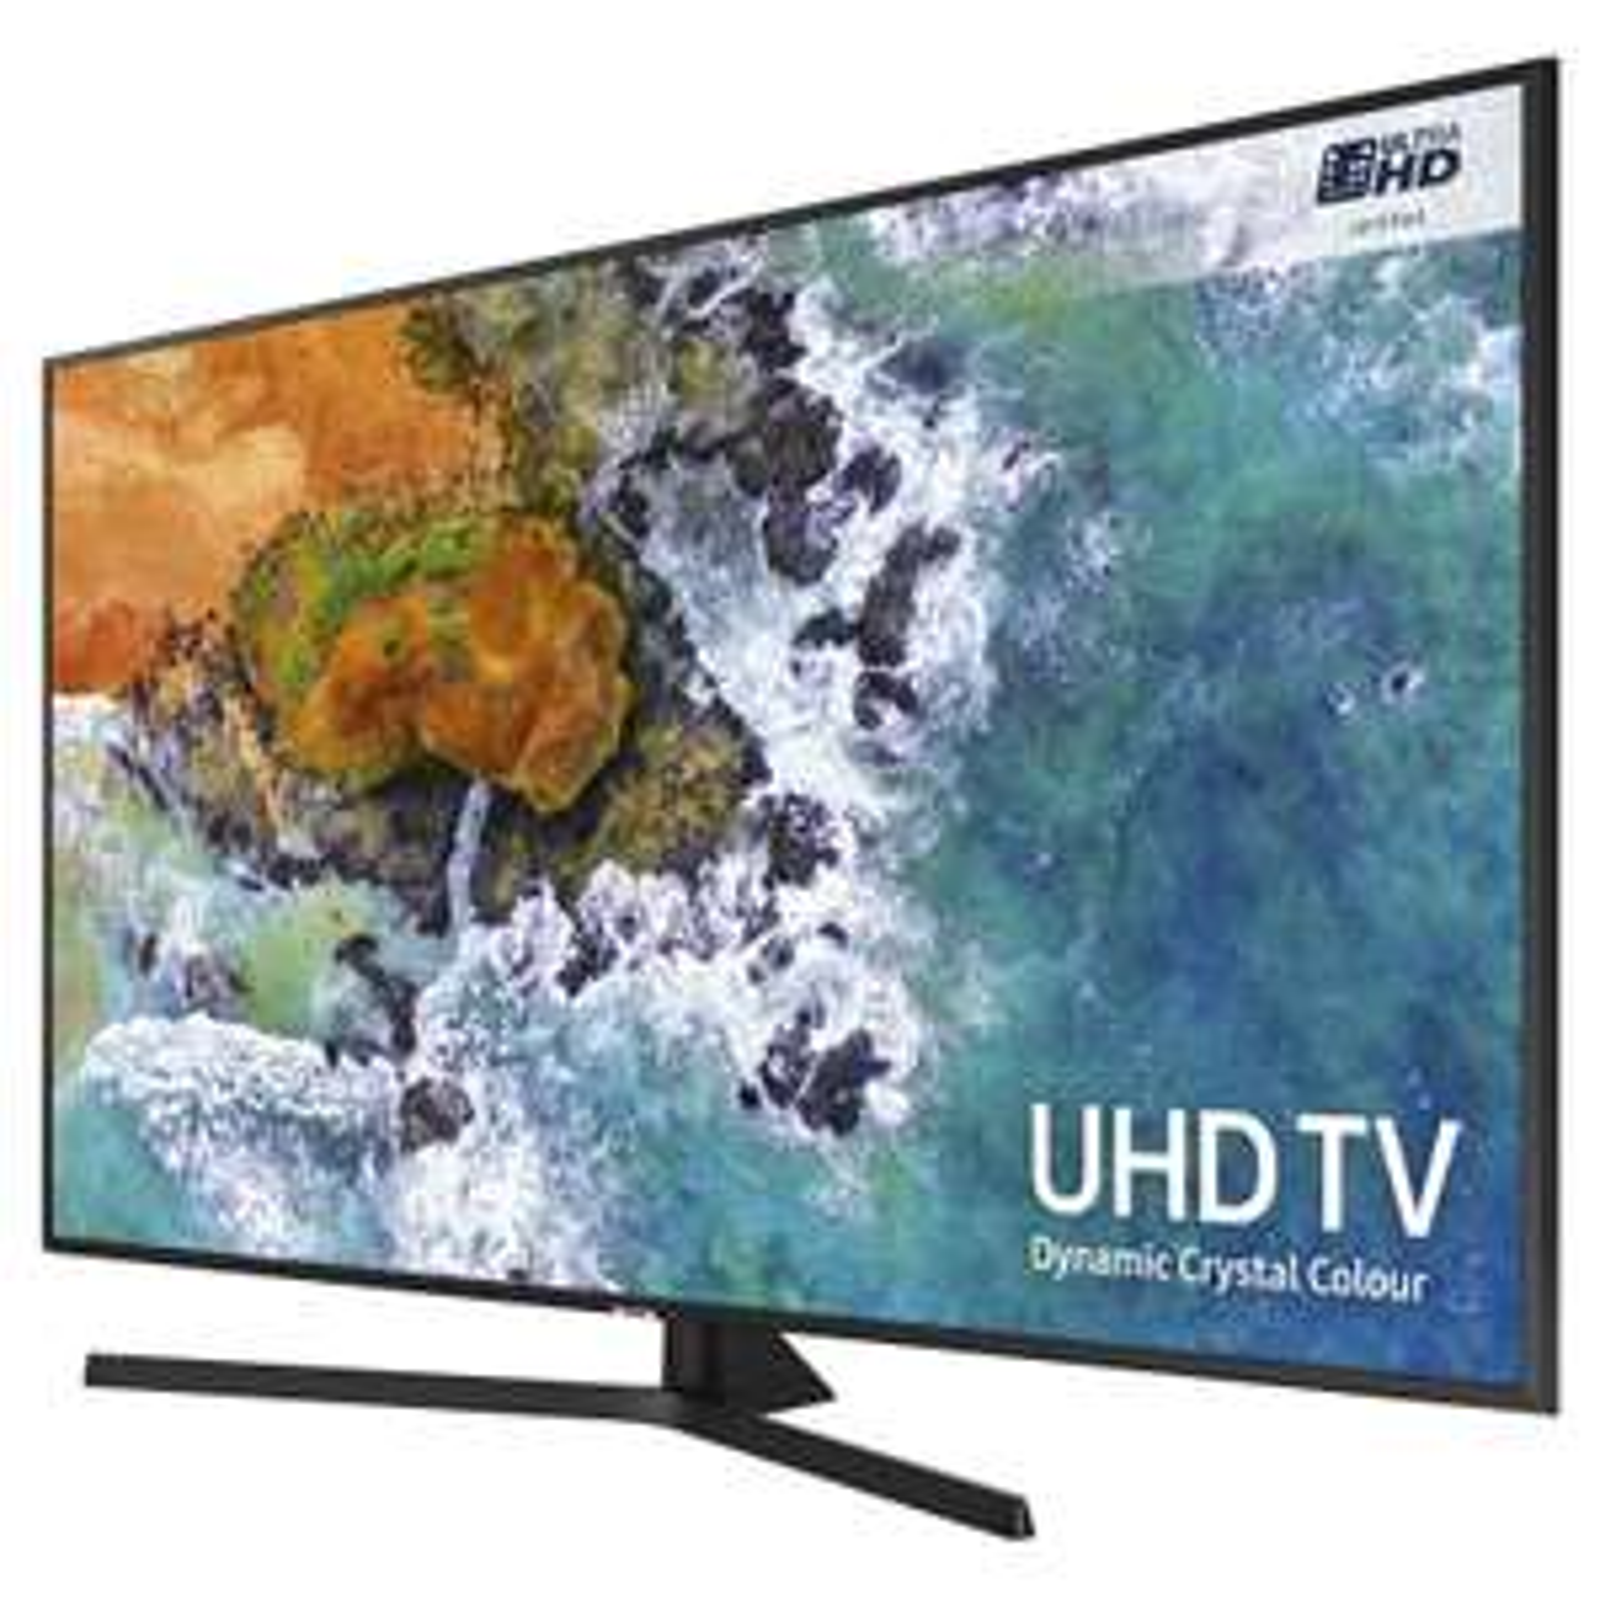 SAMSUNG UE43NU7400 43'' UHD HDR Dynamic CRYSTAL COLOUR 4K TV £411.30 w/code / SAMSUNG UE49NU7100 49'' 4K TV £411.30 w/code @ hughes ebay